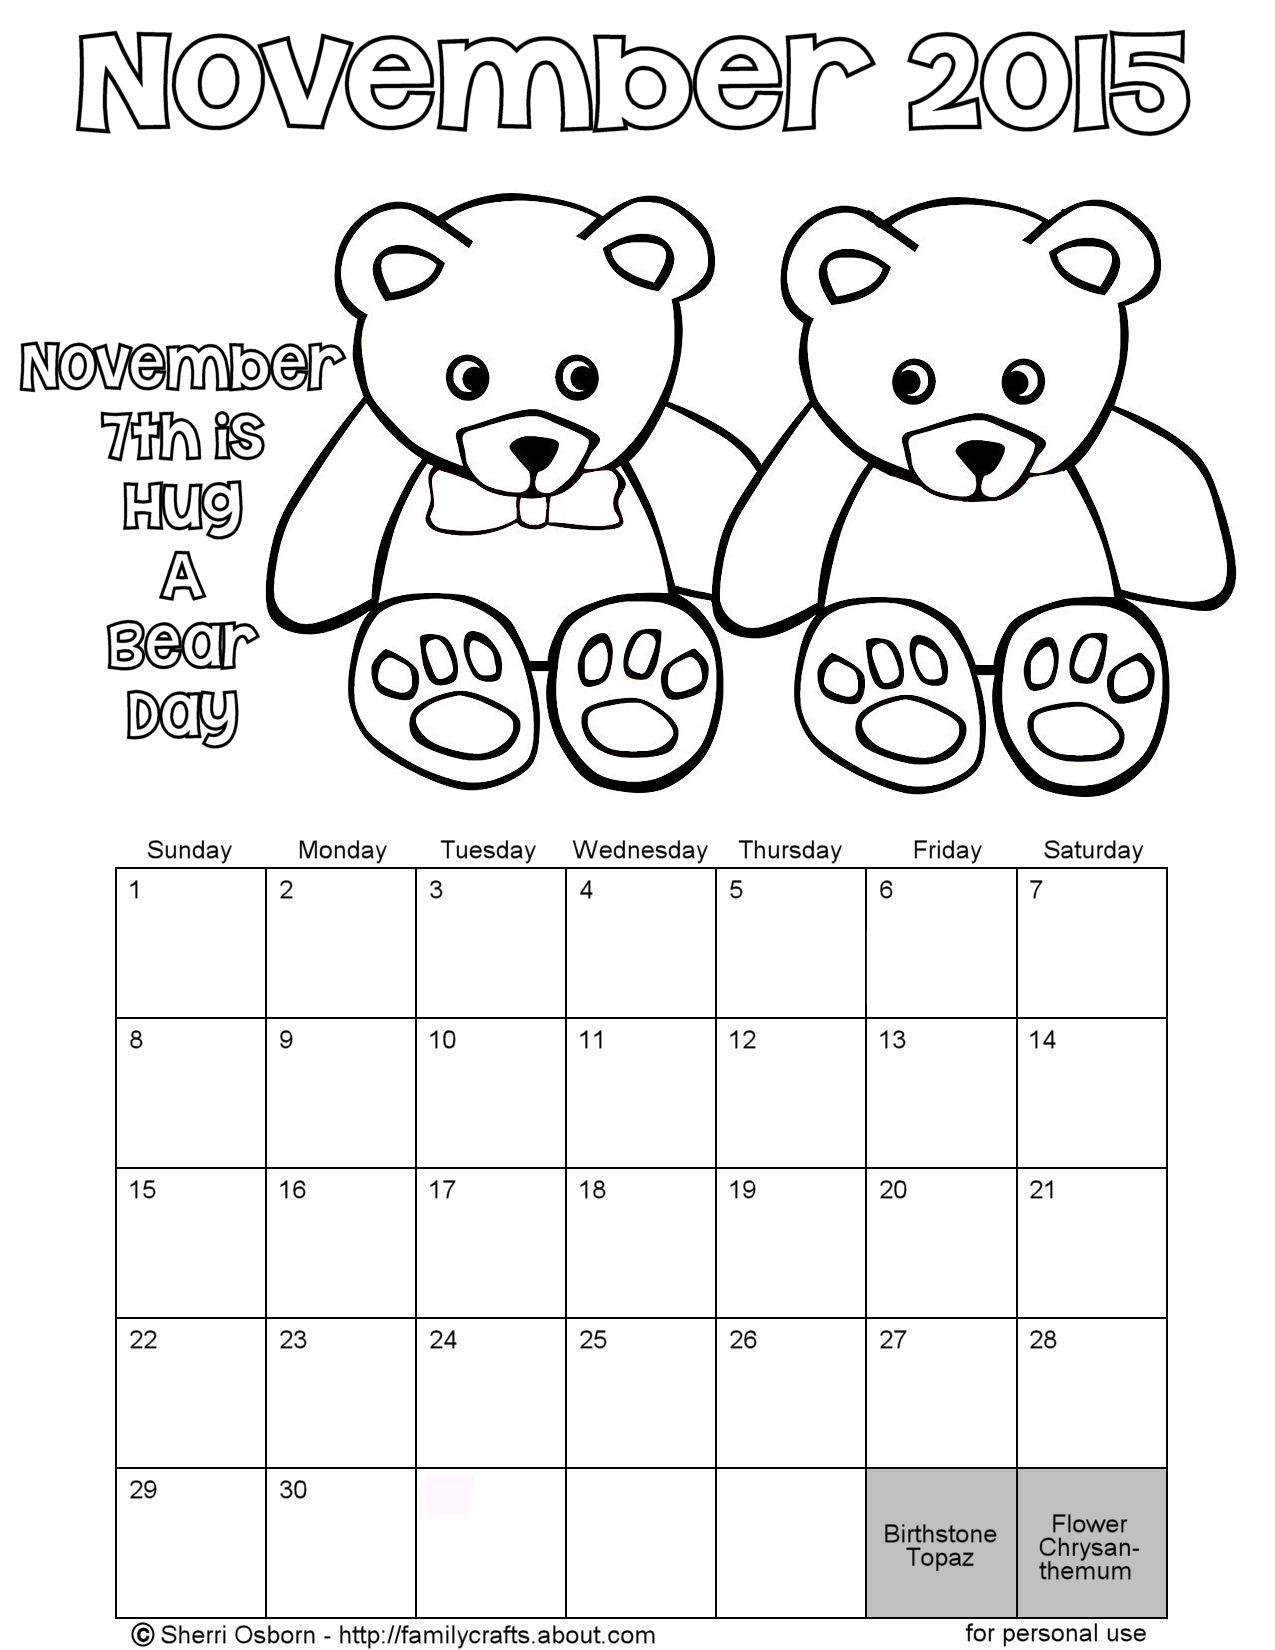 november calendar coloring pages 2015 - photo#2